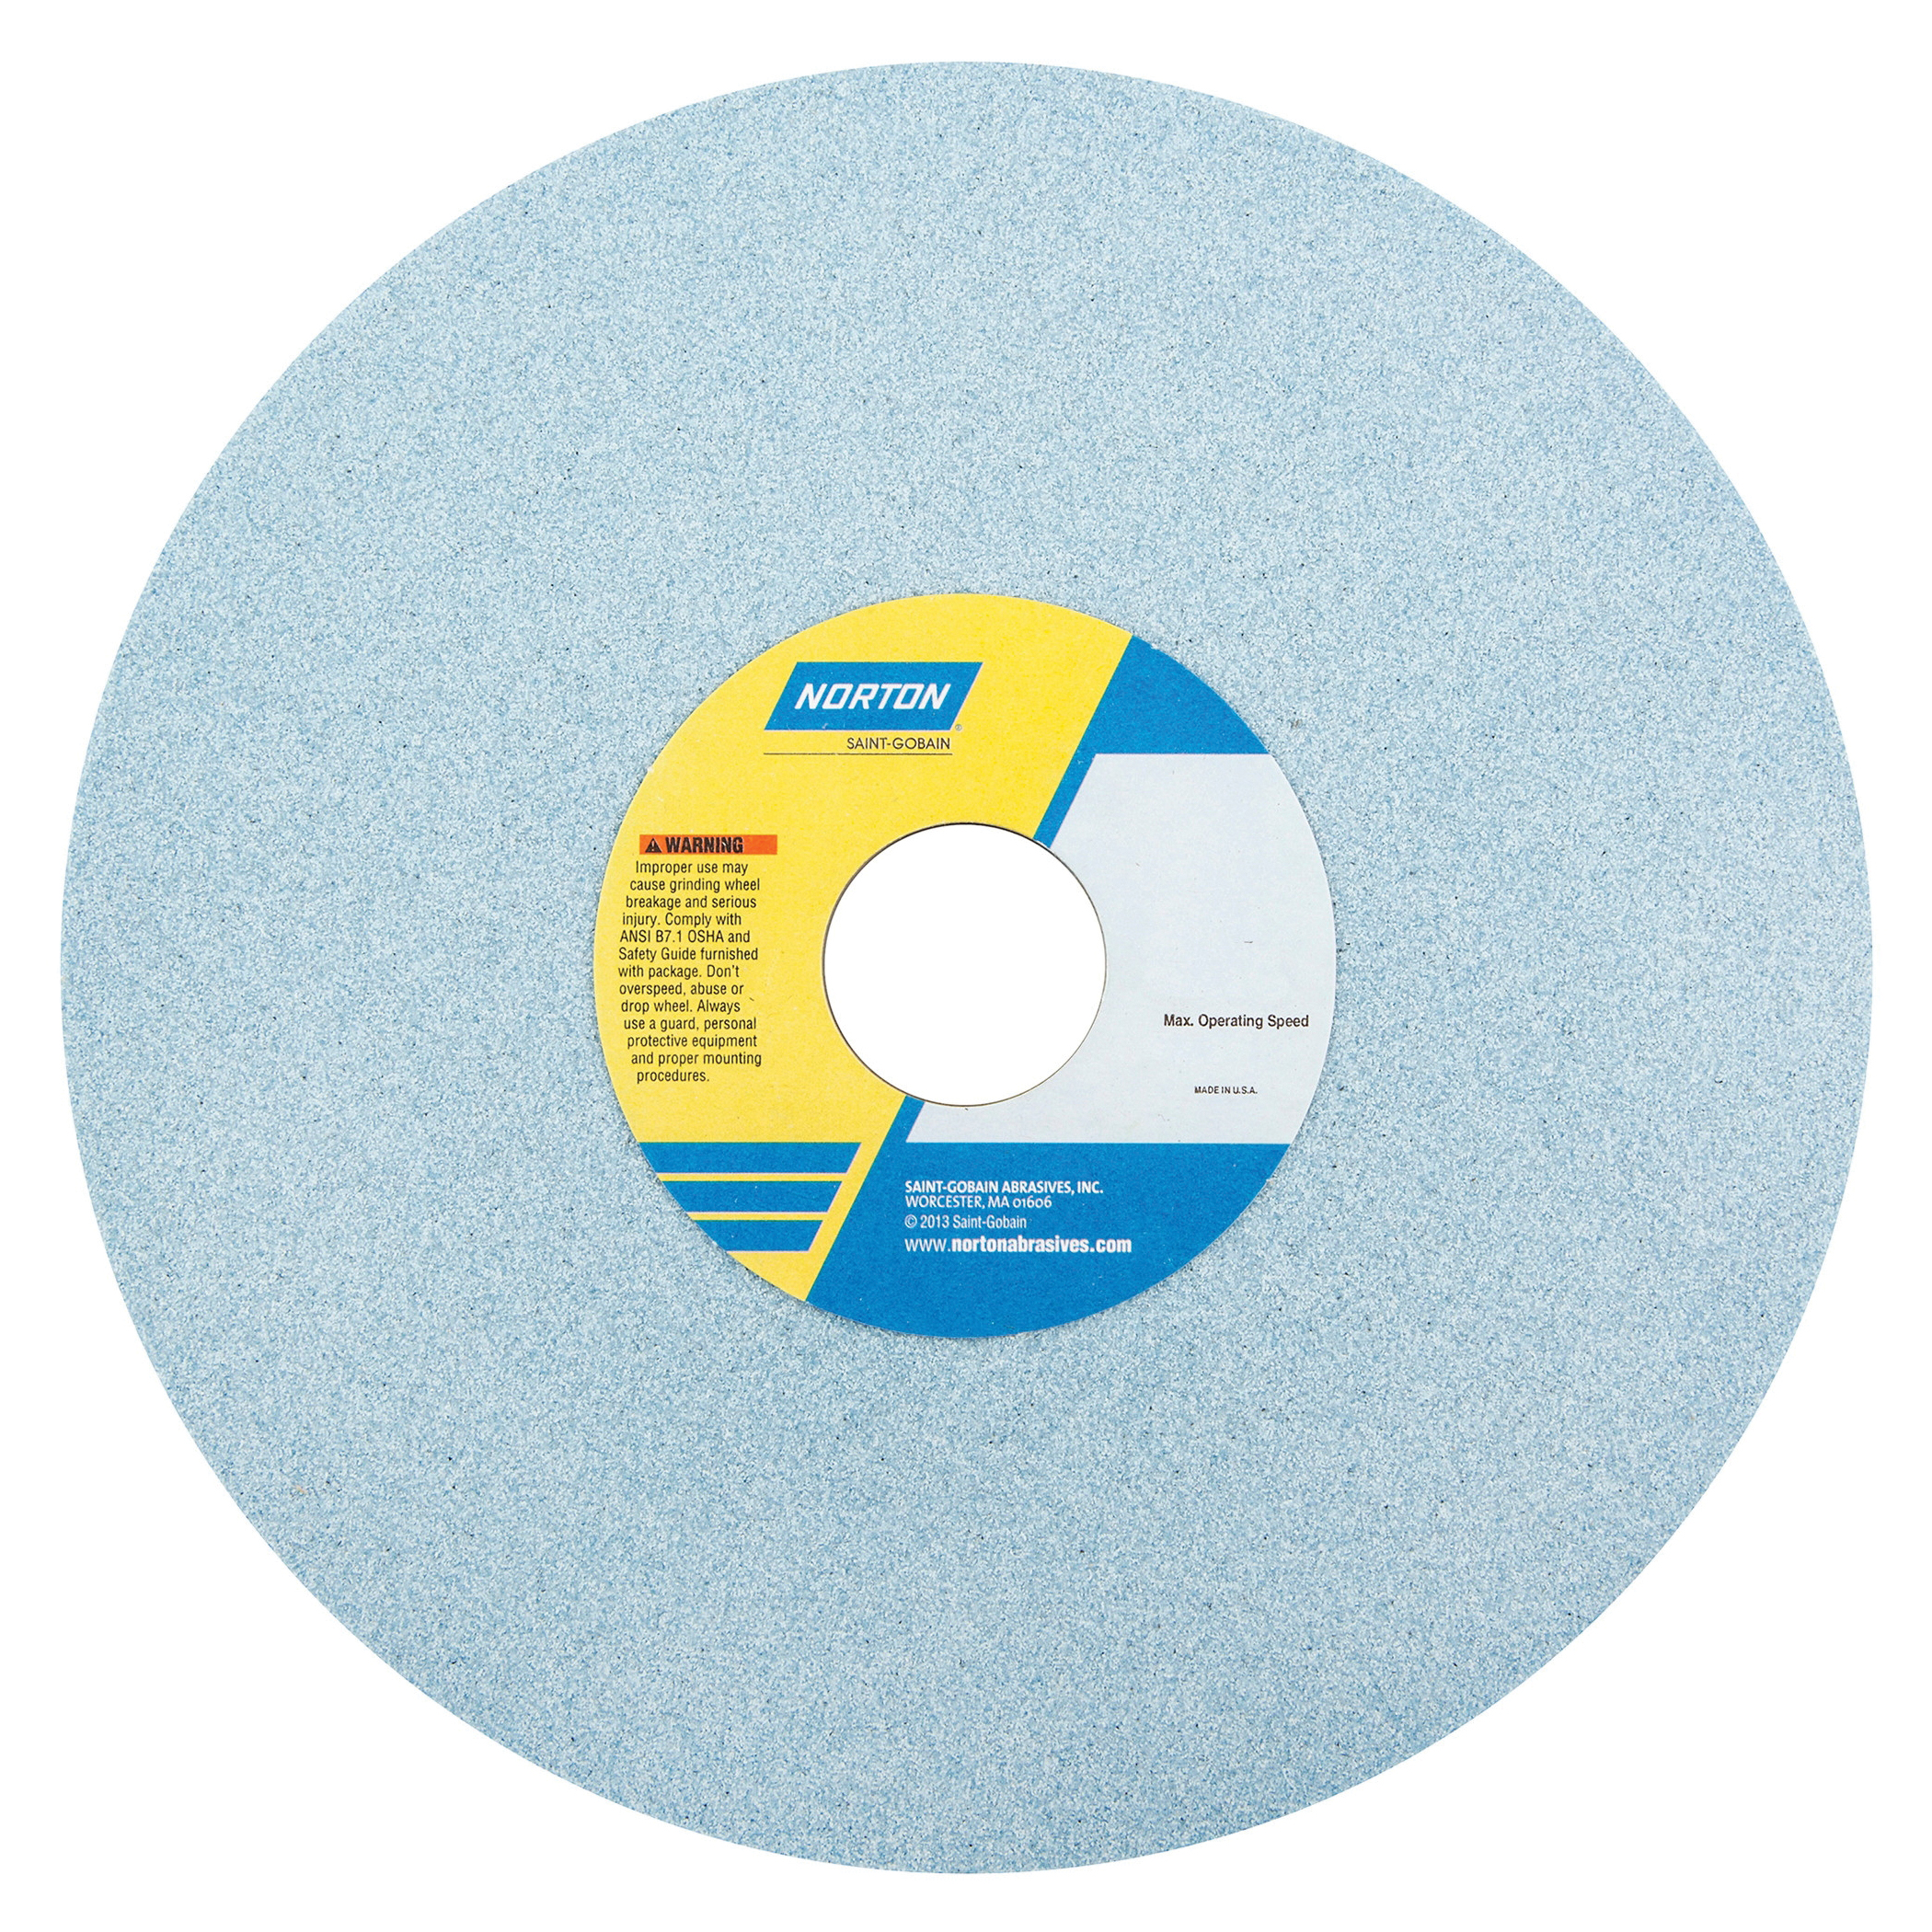 Norton® 66253313976 3SGP Straight Toolroom Wheel, 14 in Dia x 1-1/2 in THK, 5 in Center Hole, 46 Grit, Ceramic Alumina/Friable Aluminum Oxide Abrasive